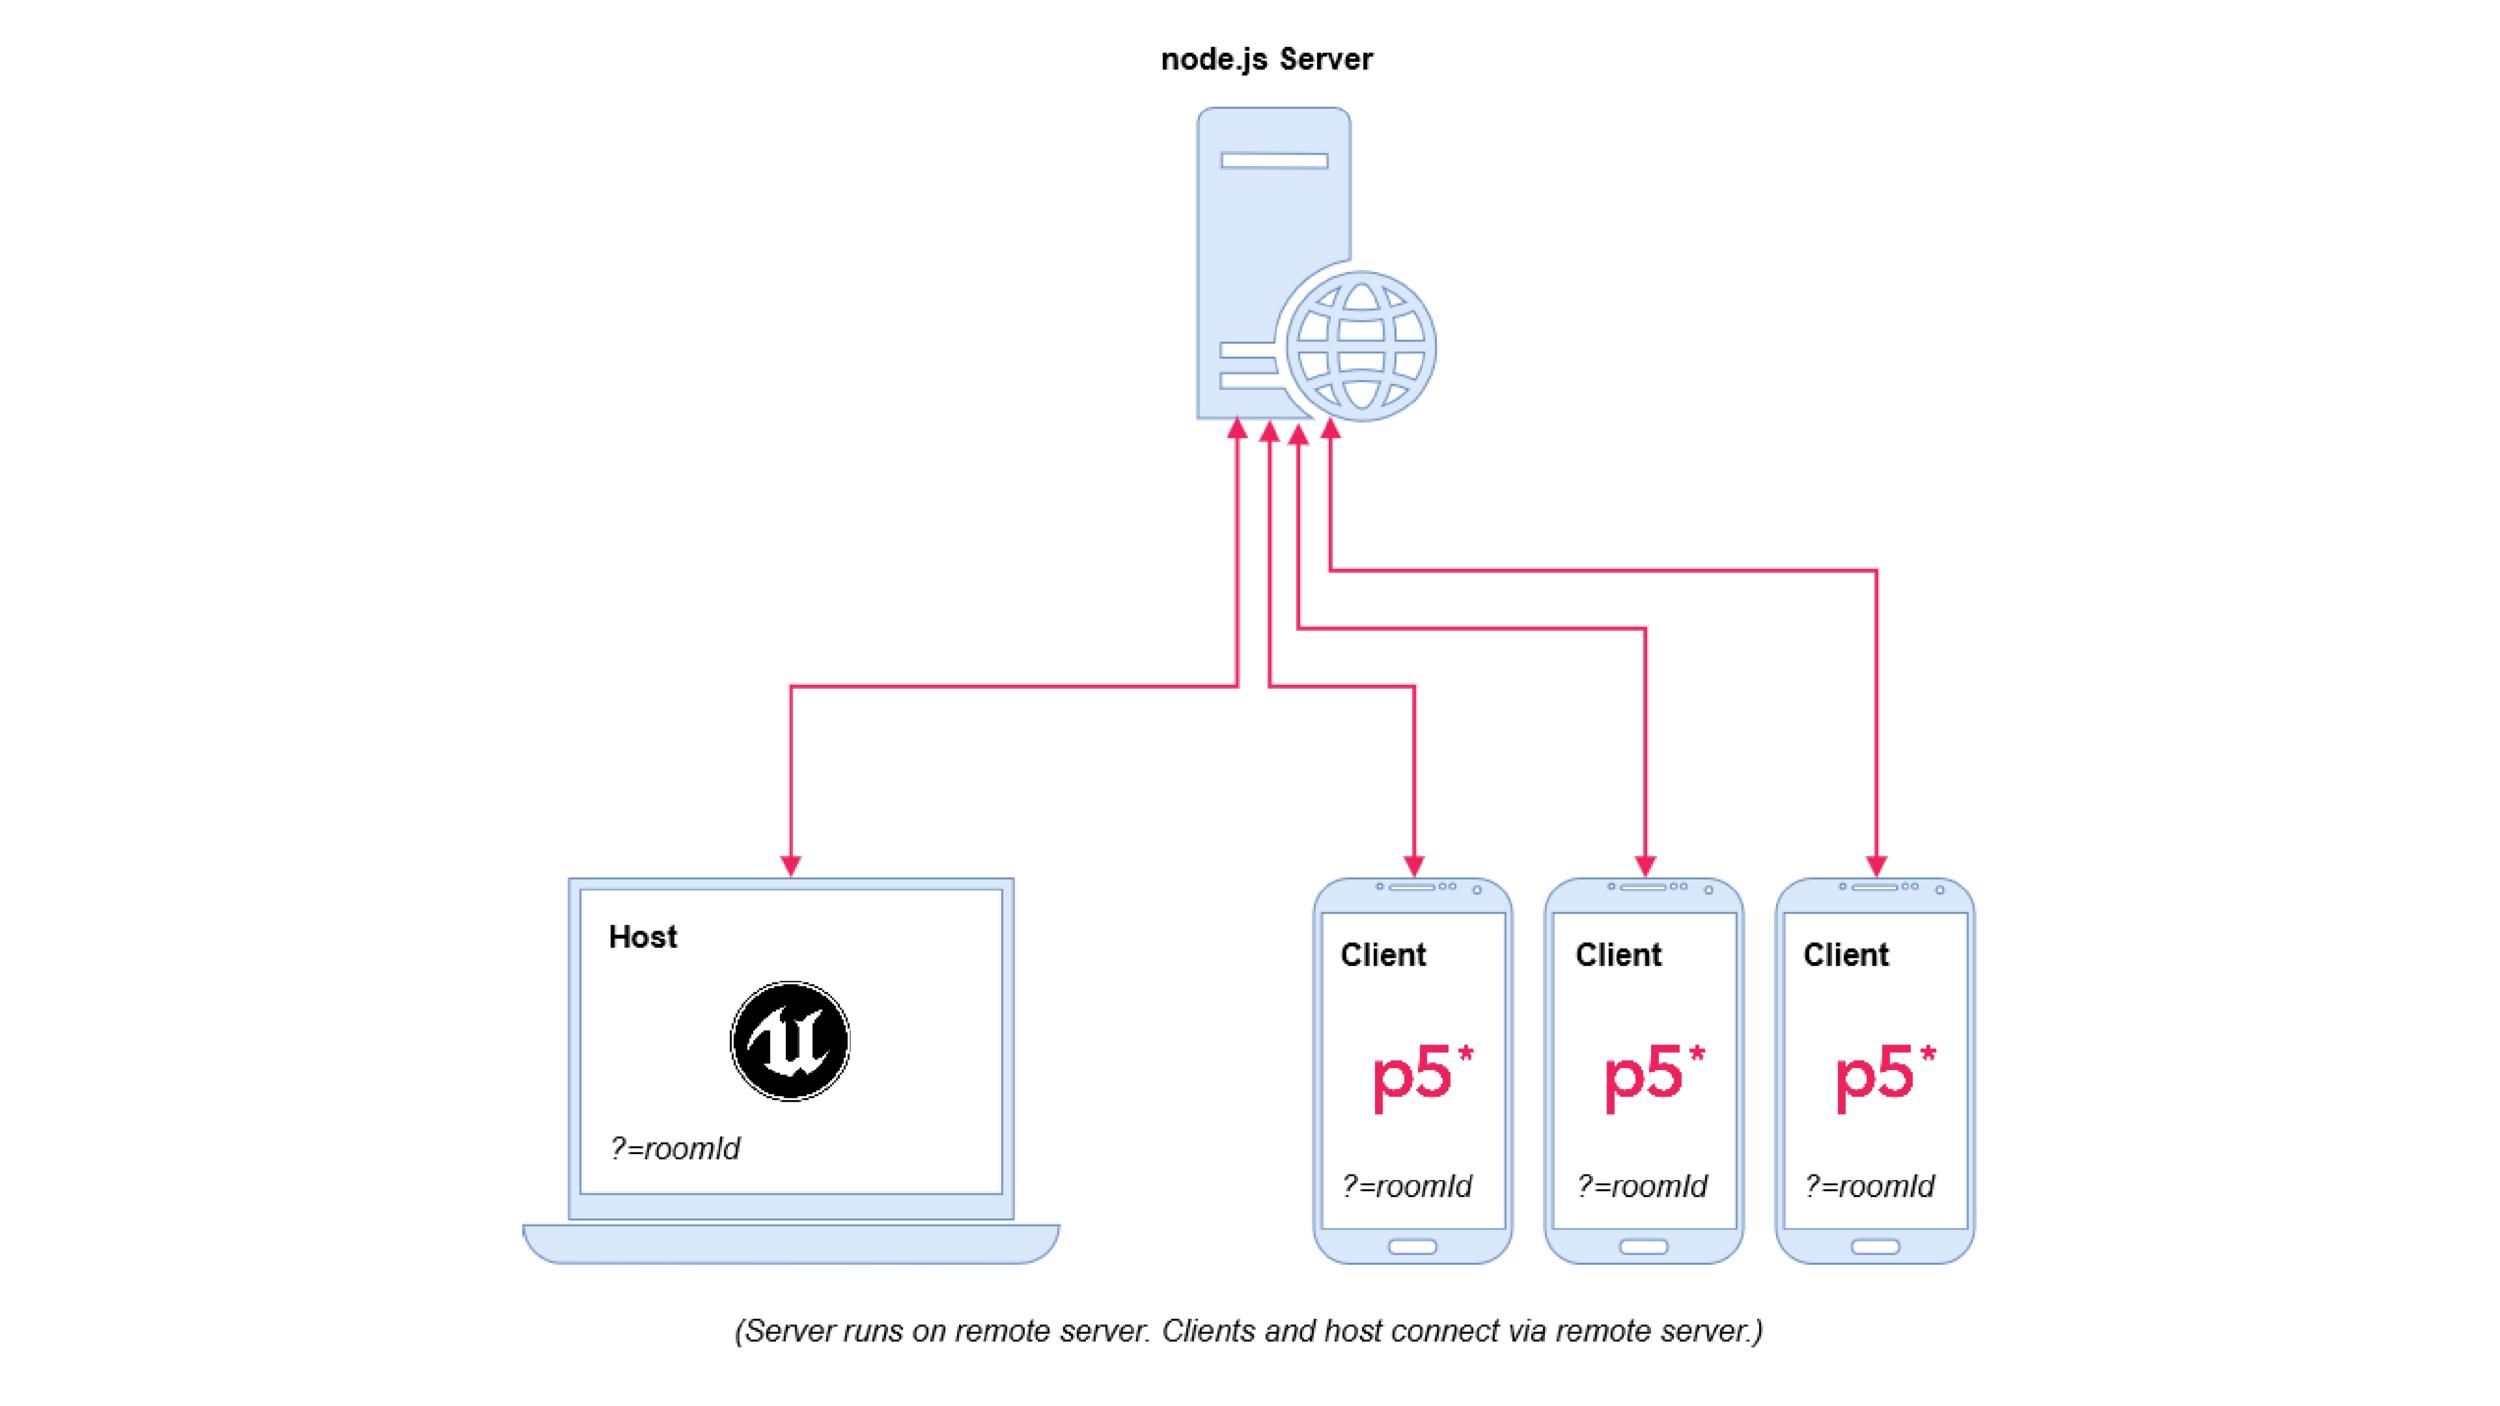 p5-multiplayer_custom@2x.png